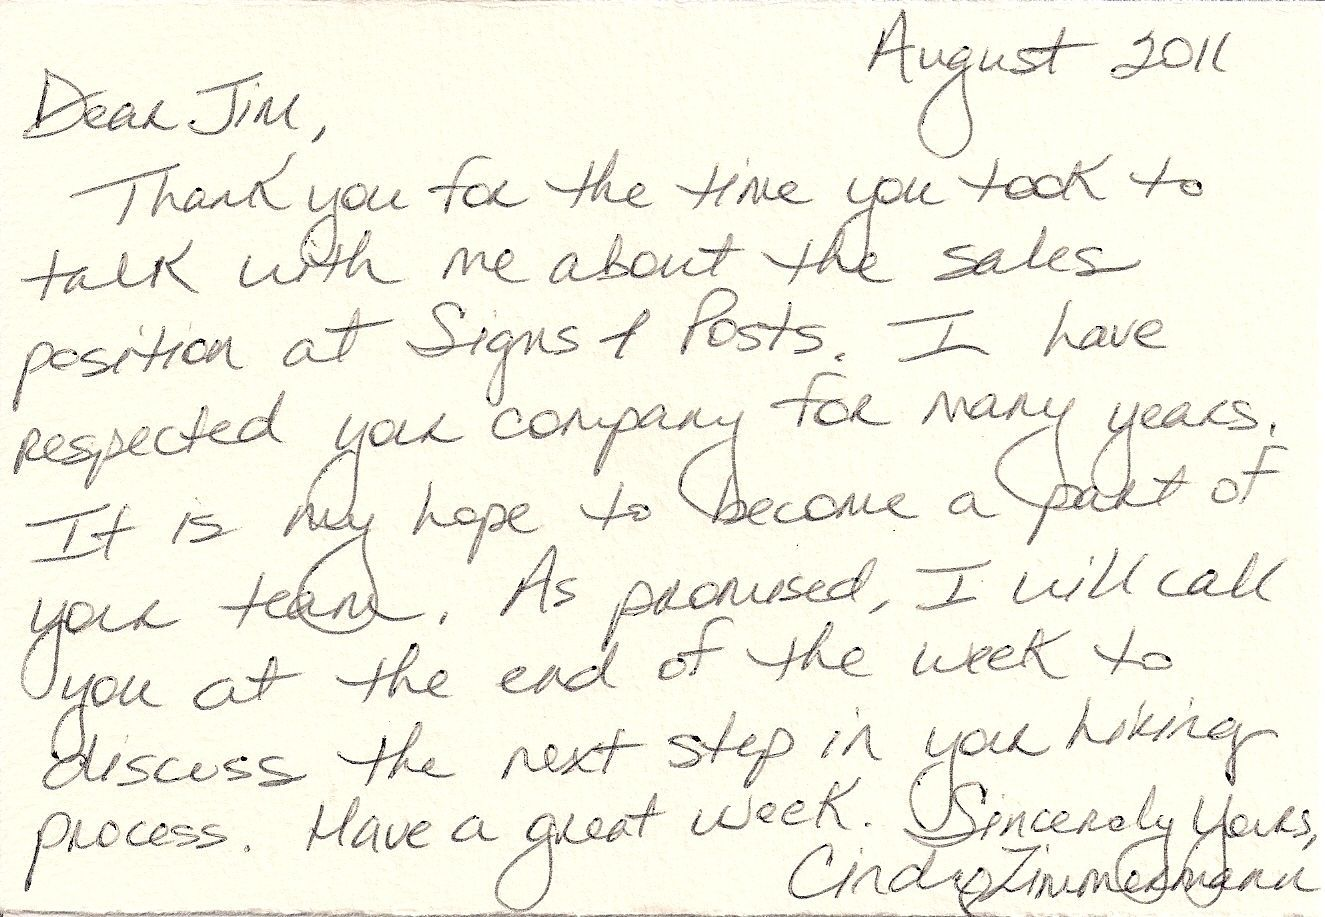 003 Astounding Handwritten Thank You Note After Interview Template Sample Full